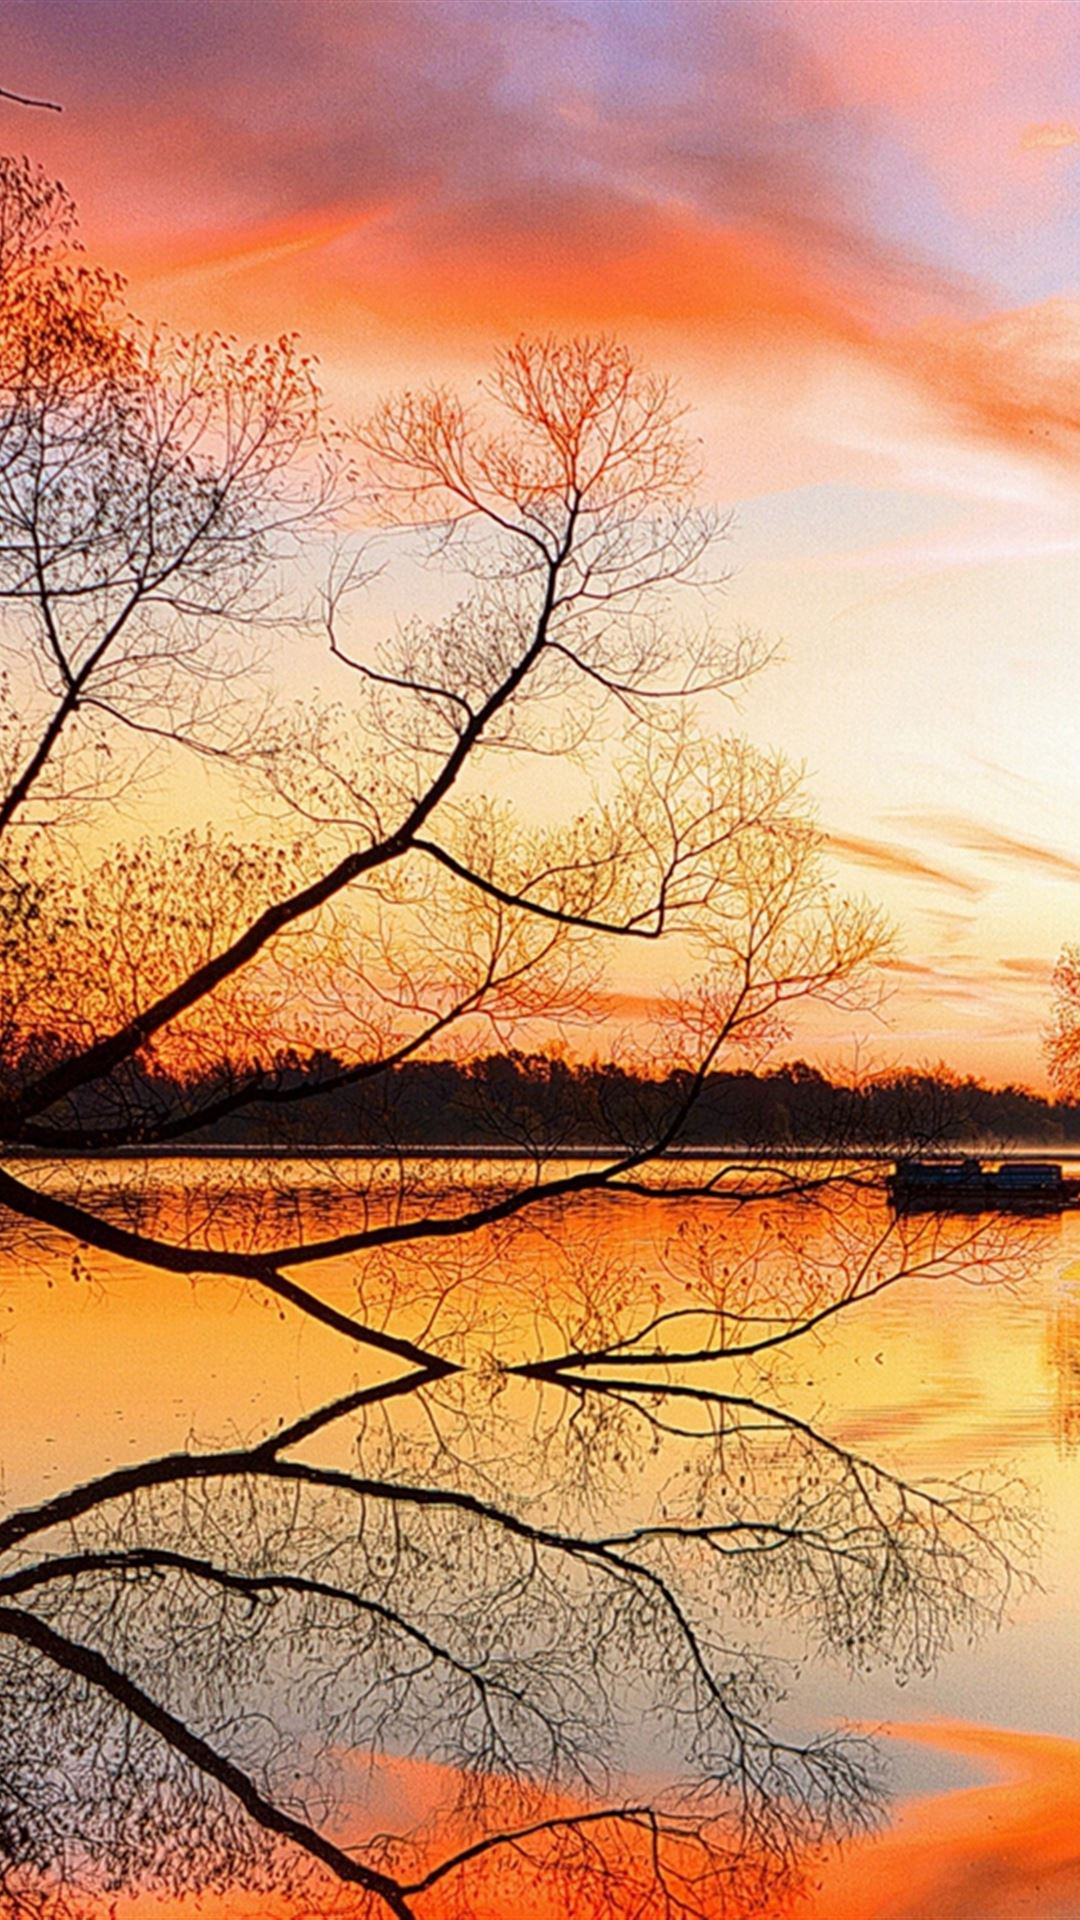 Lake Sunset Trees Landscape Beach Art Night Reflection iPhone 4s wallpaper